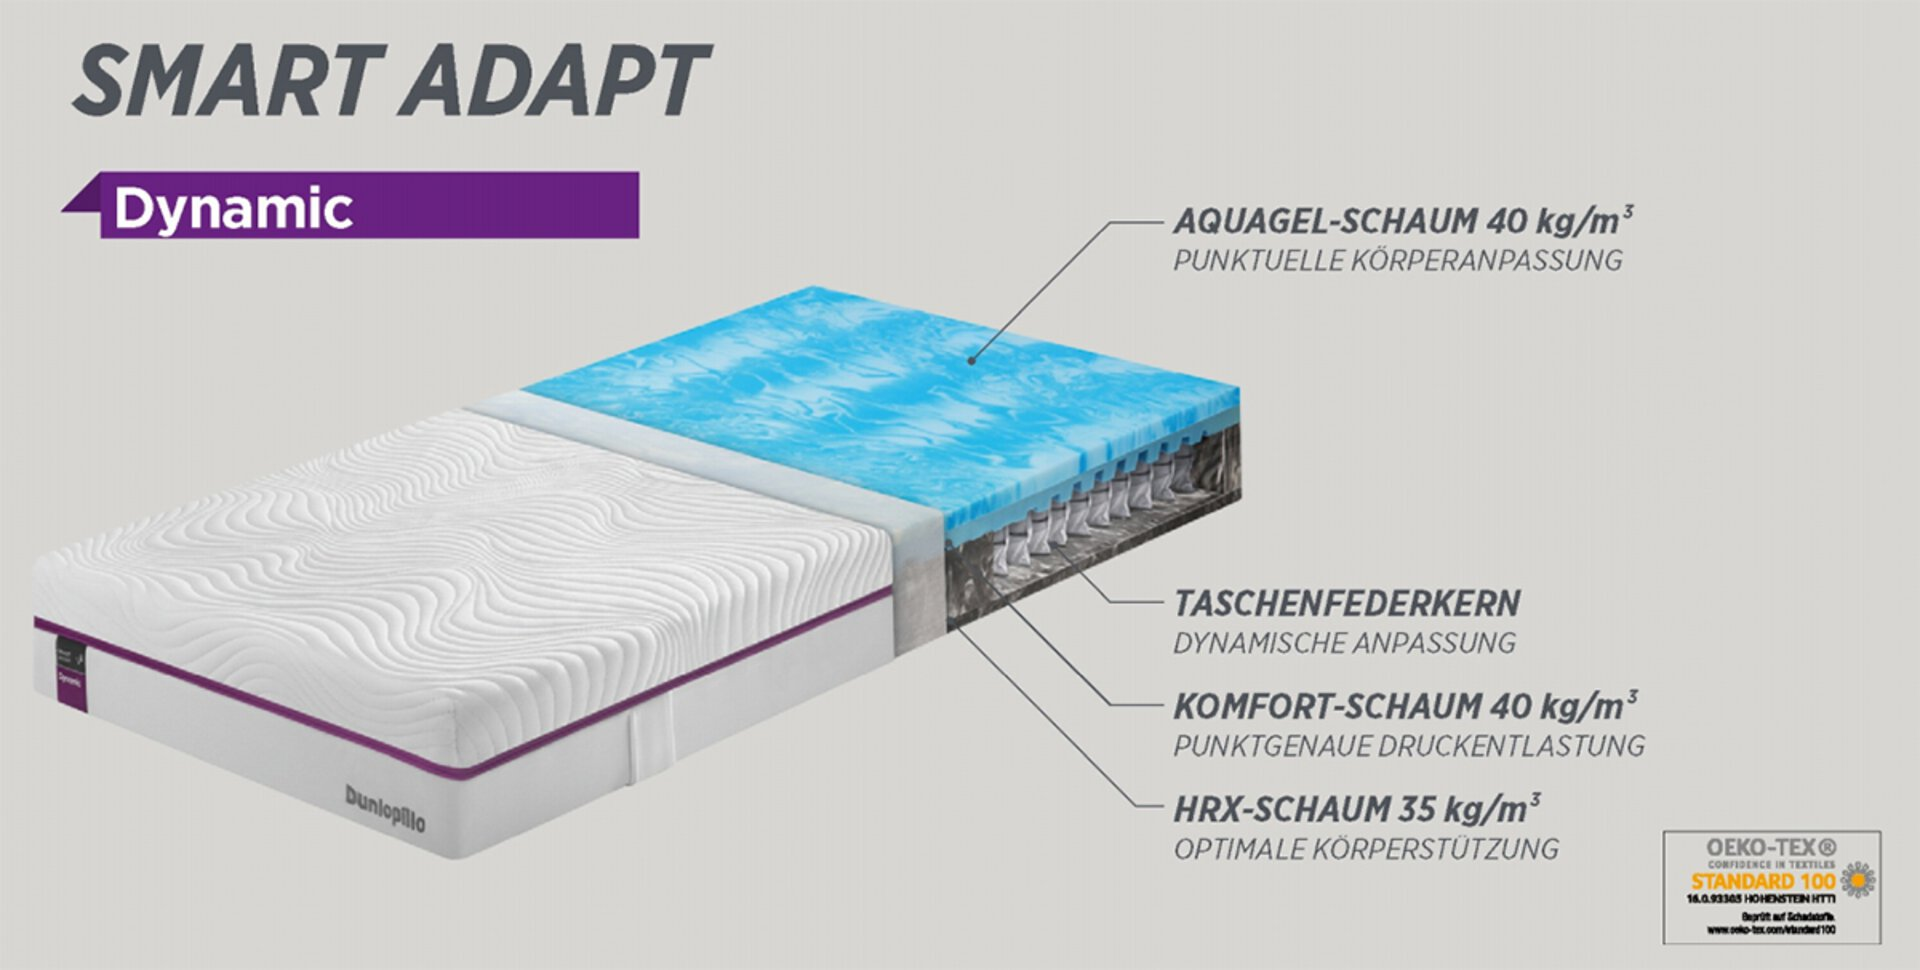 Kaltschaummatratze Smart Adapt Dunlopillo Textil weiß 200 x 21 x 200 cm